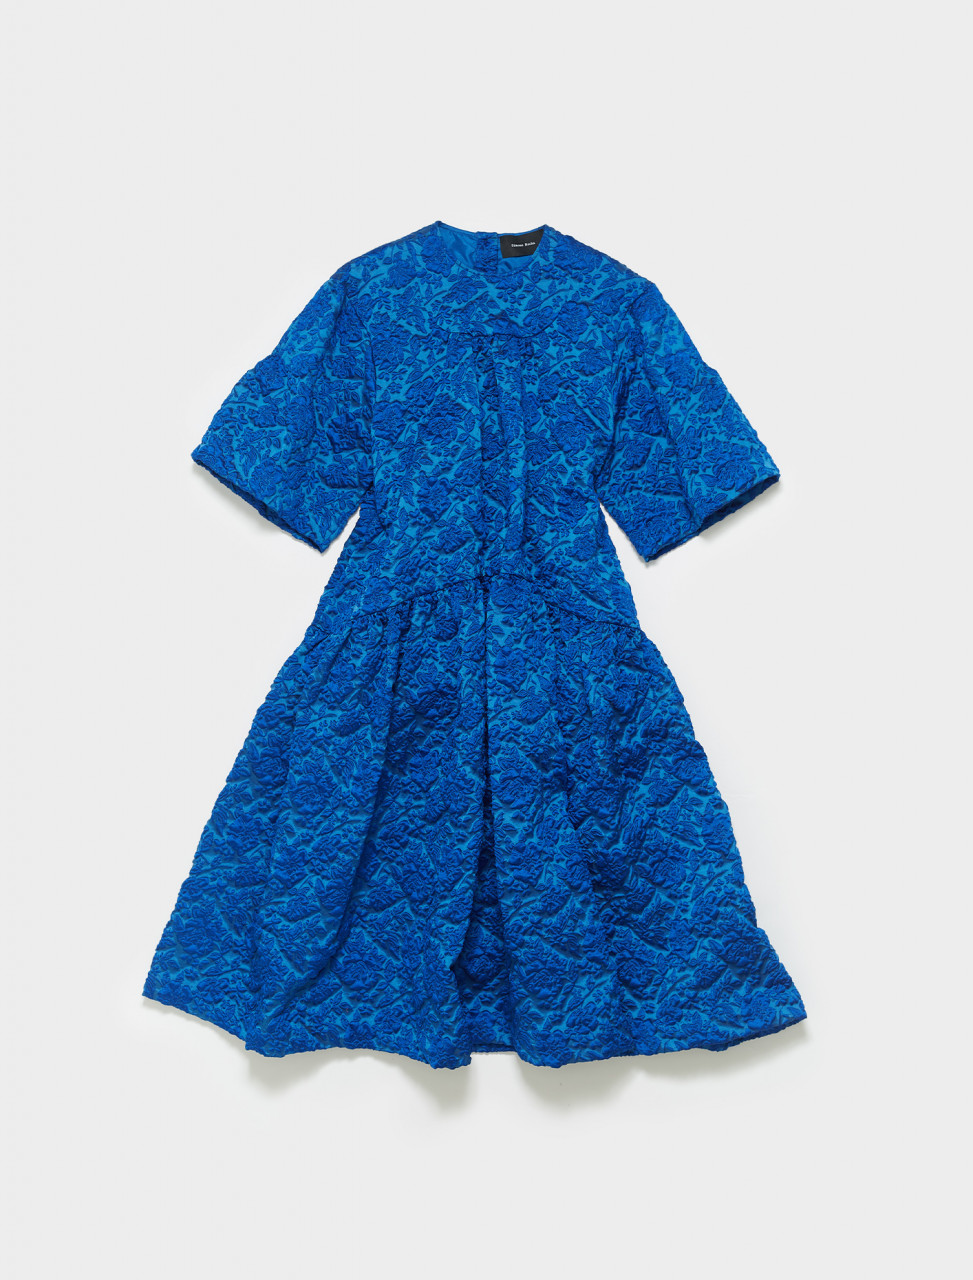 290-7007-0385 SIMONE ROCHA LONG GATHERED DRESS BLUE